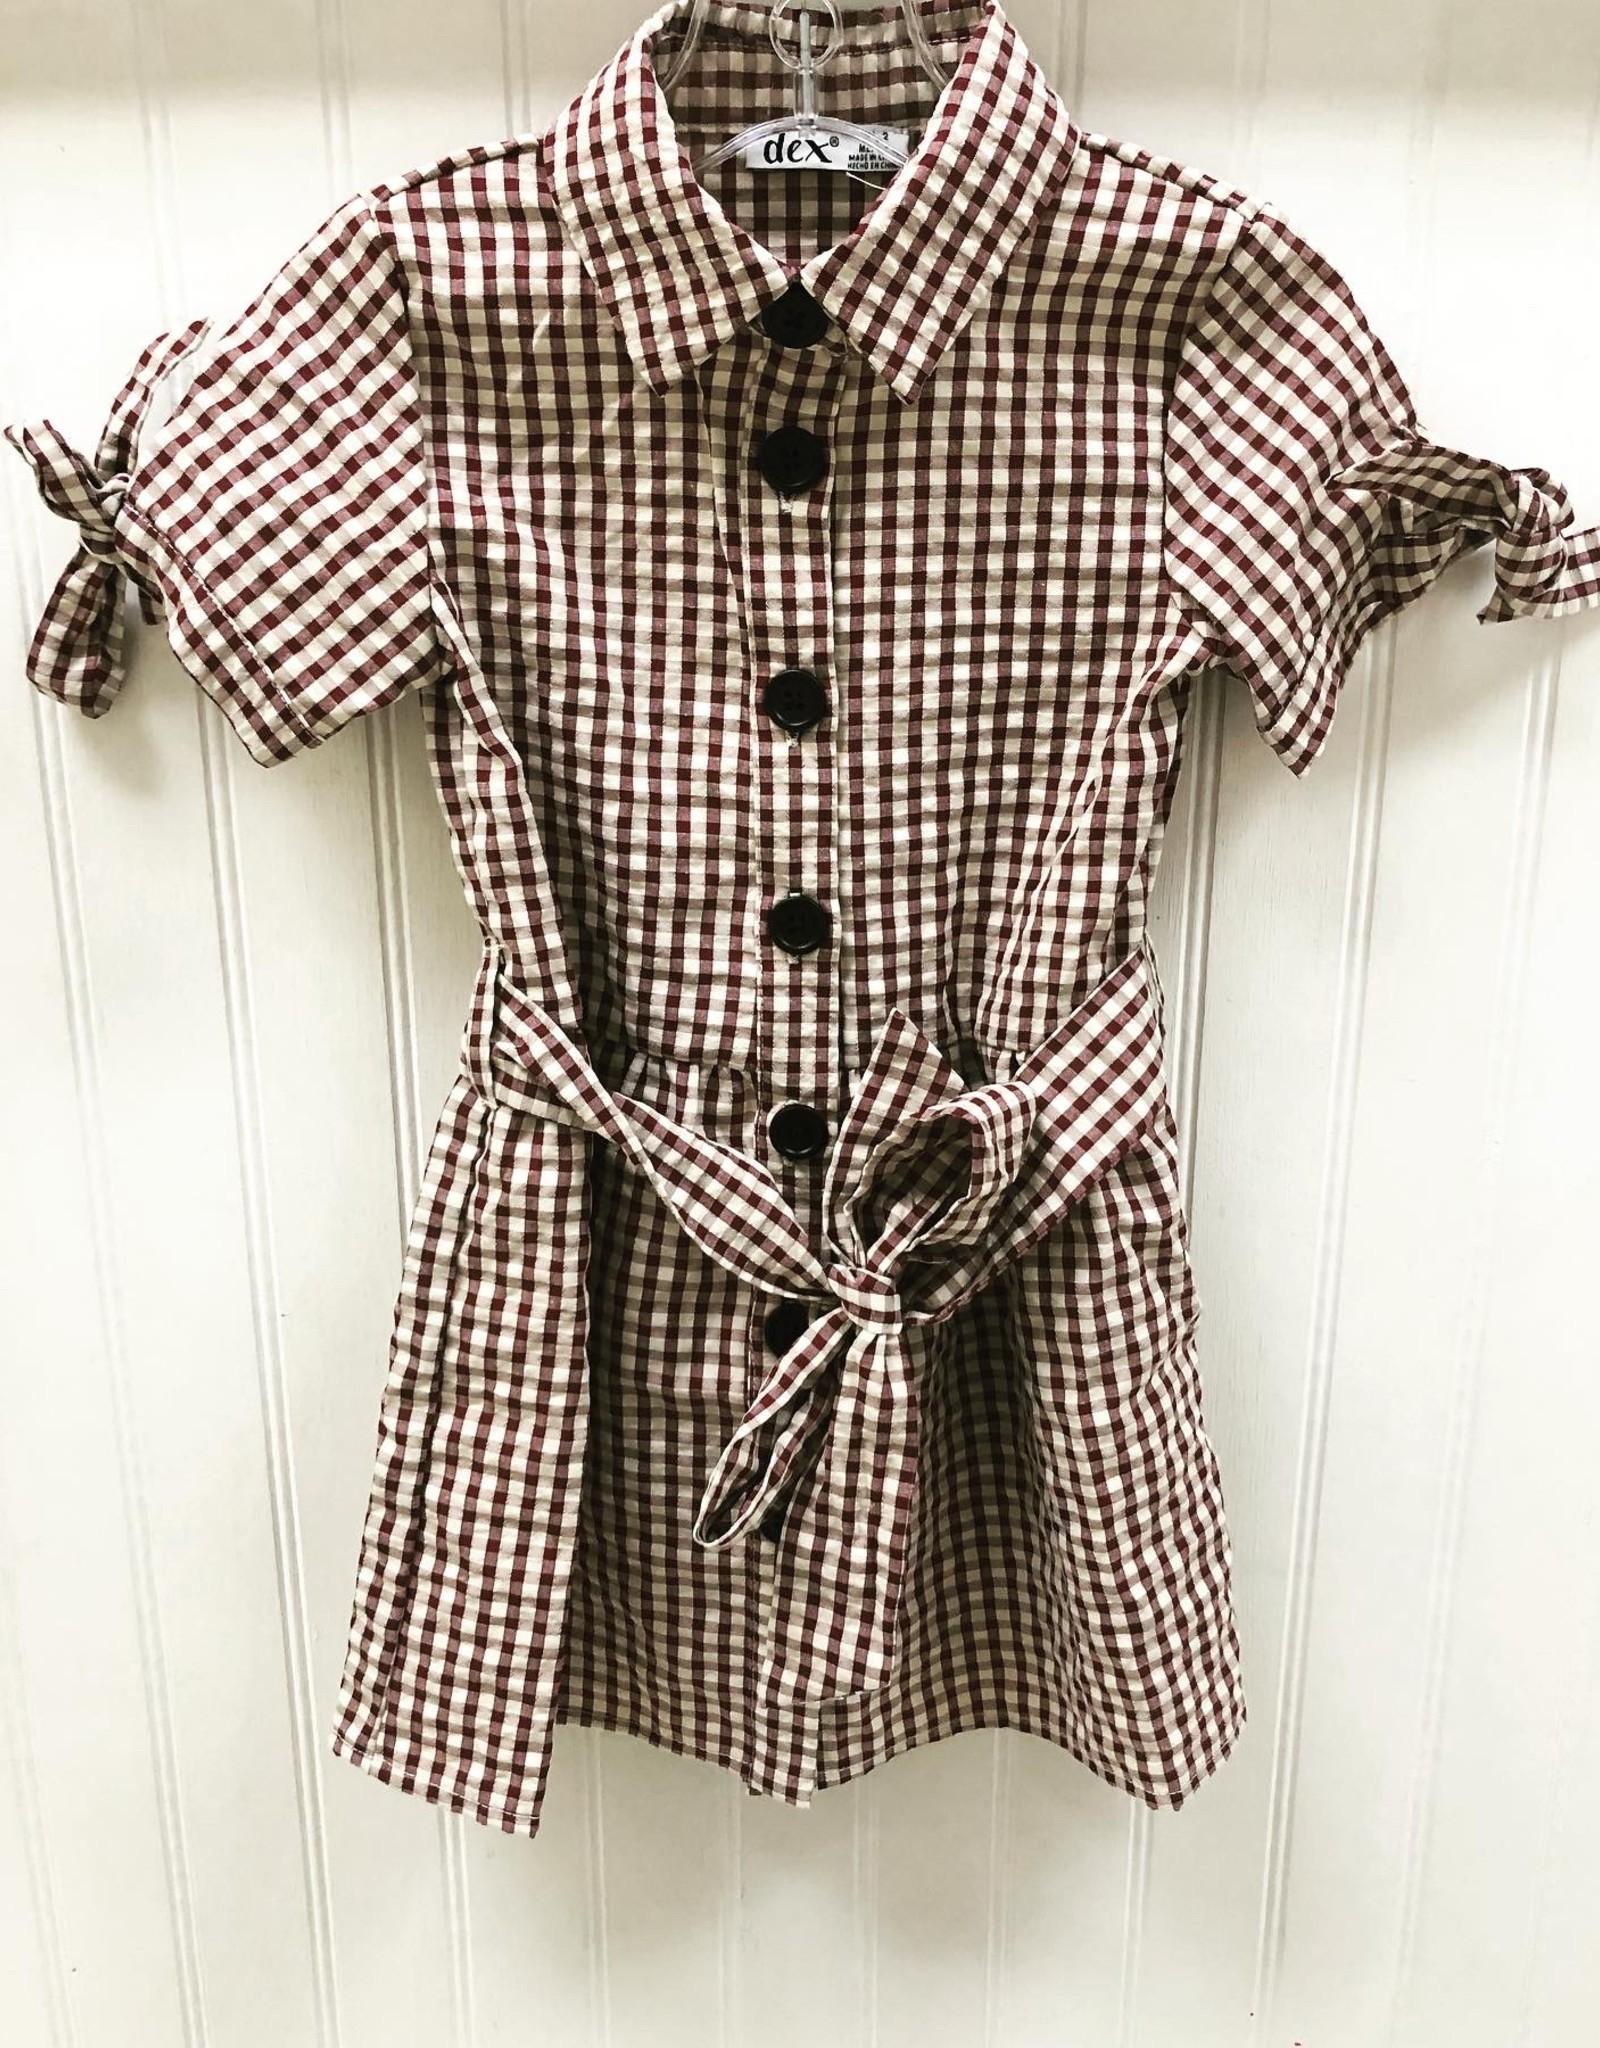 DEX Gingham dress